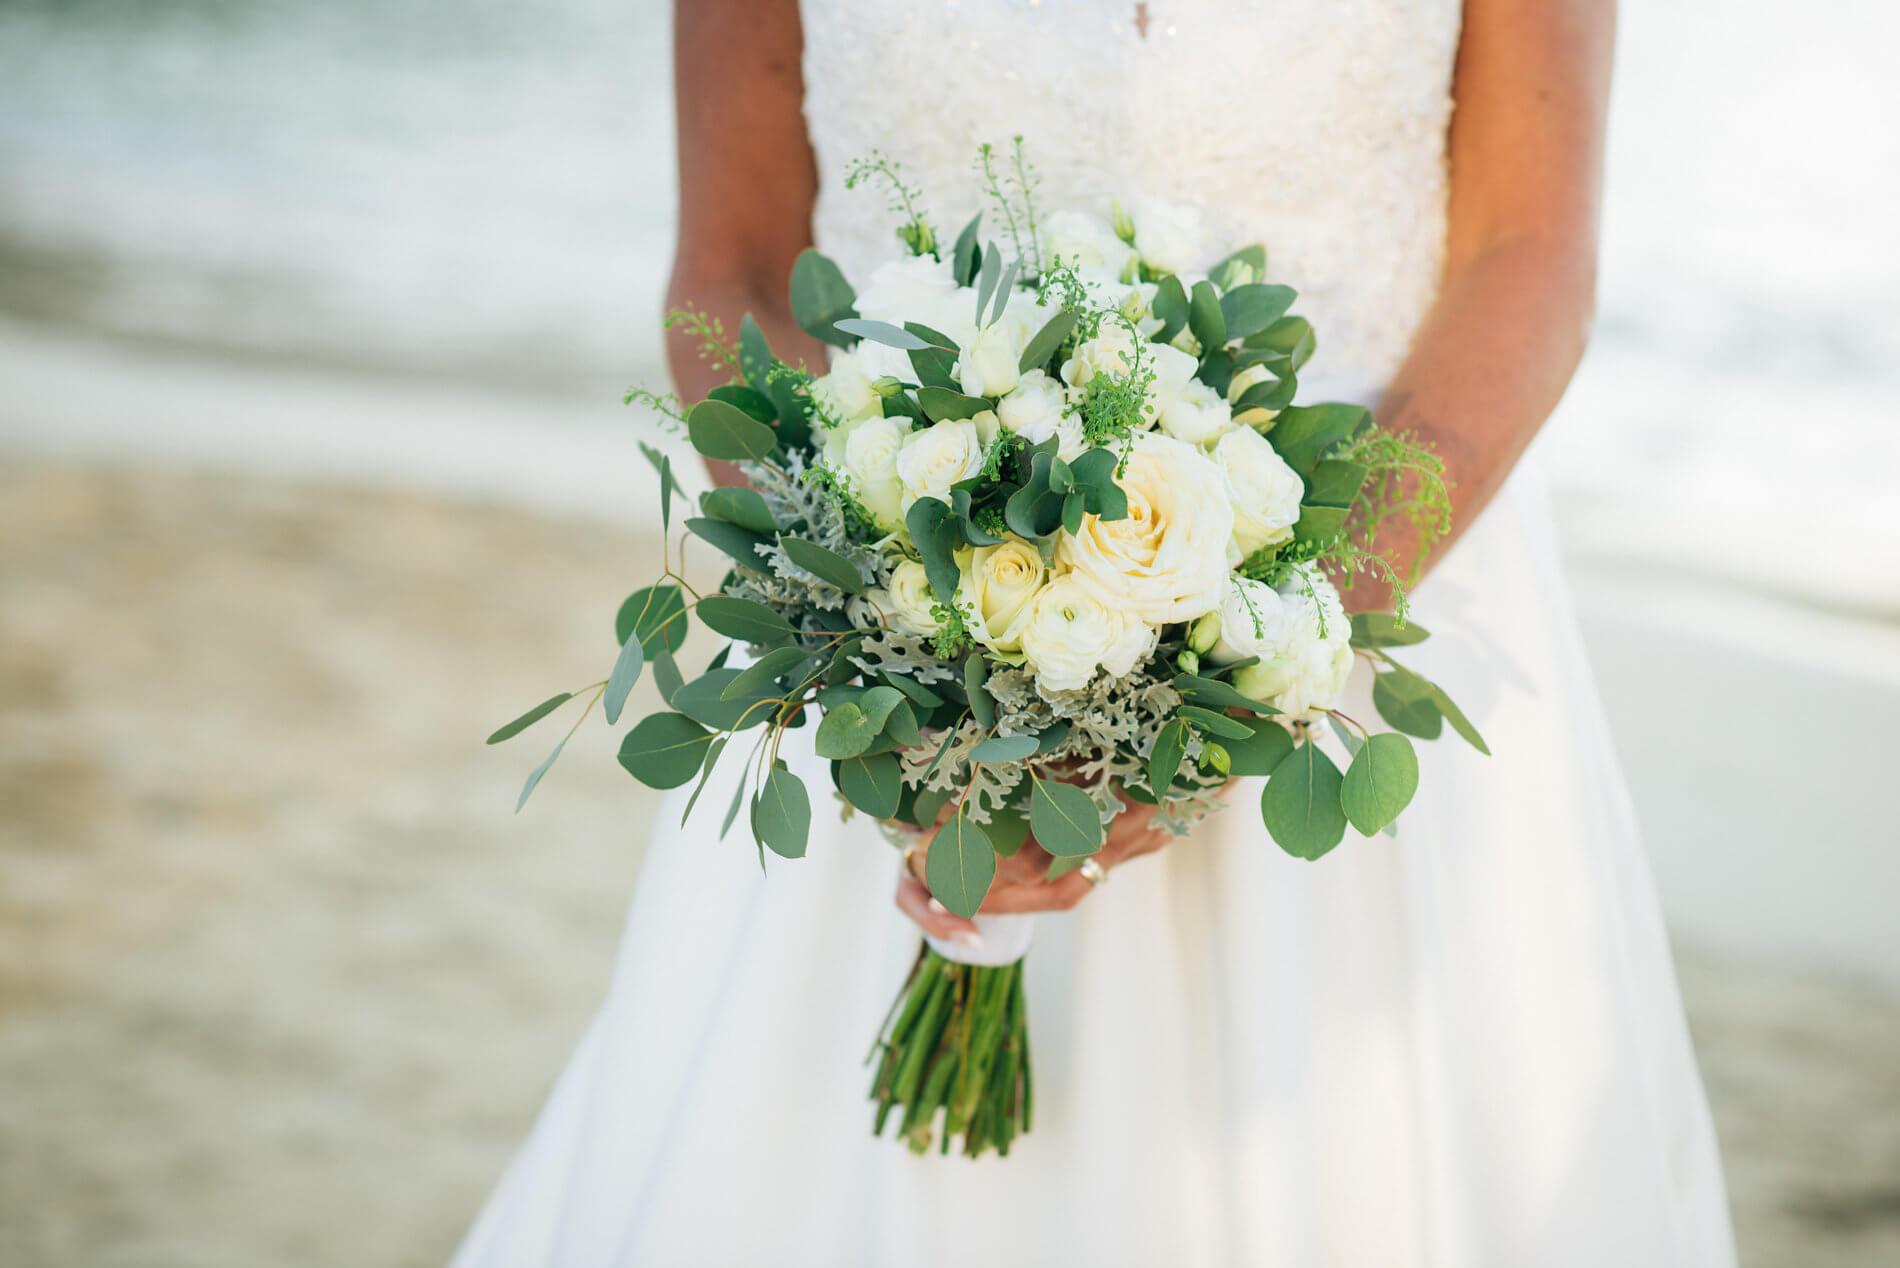 https://www.white-ibiza.com/wp-content/uploads/2020/03/ibiza-wedding-venue-maya-beach-club-2020-10.jpg